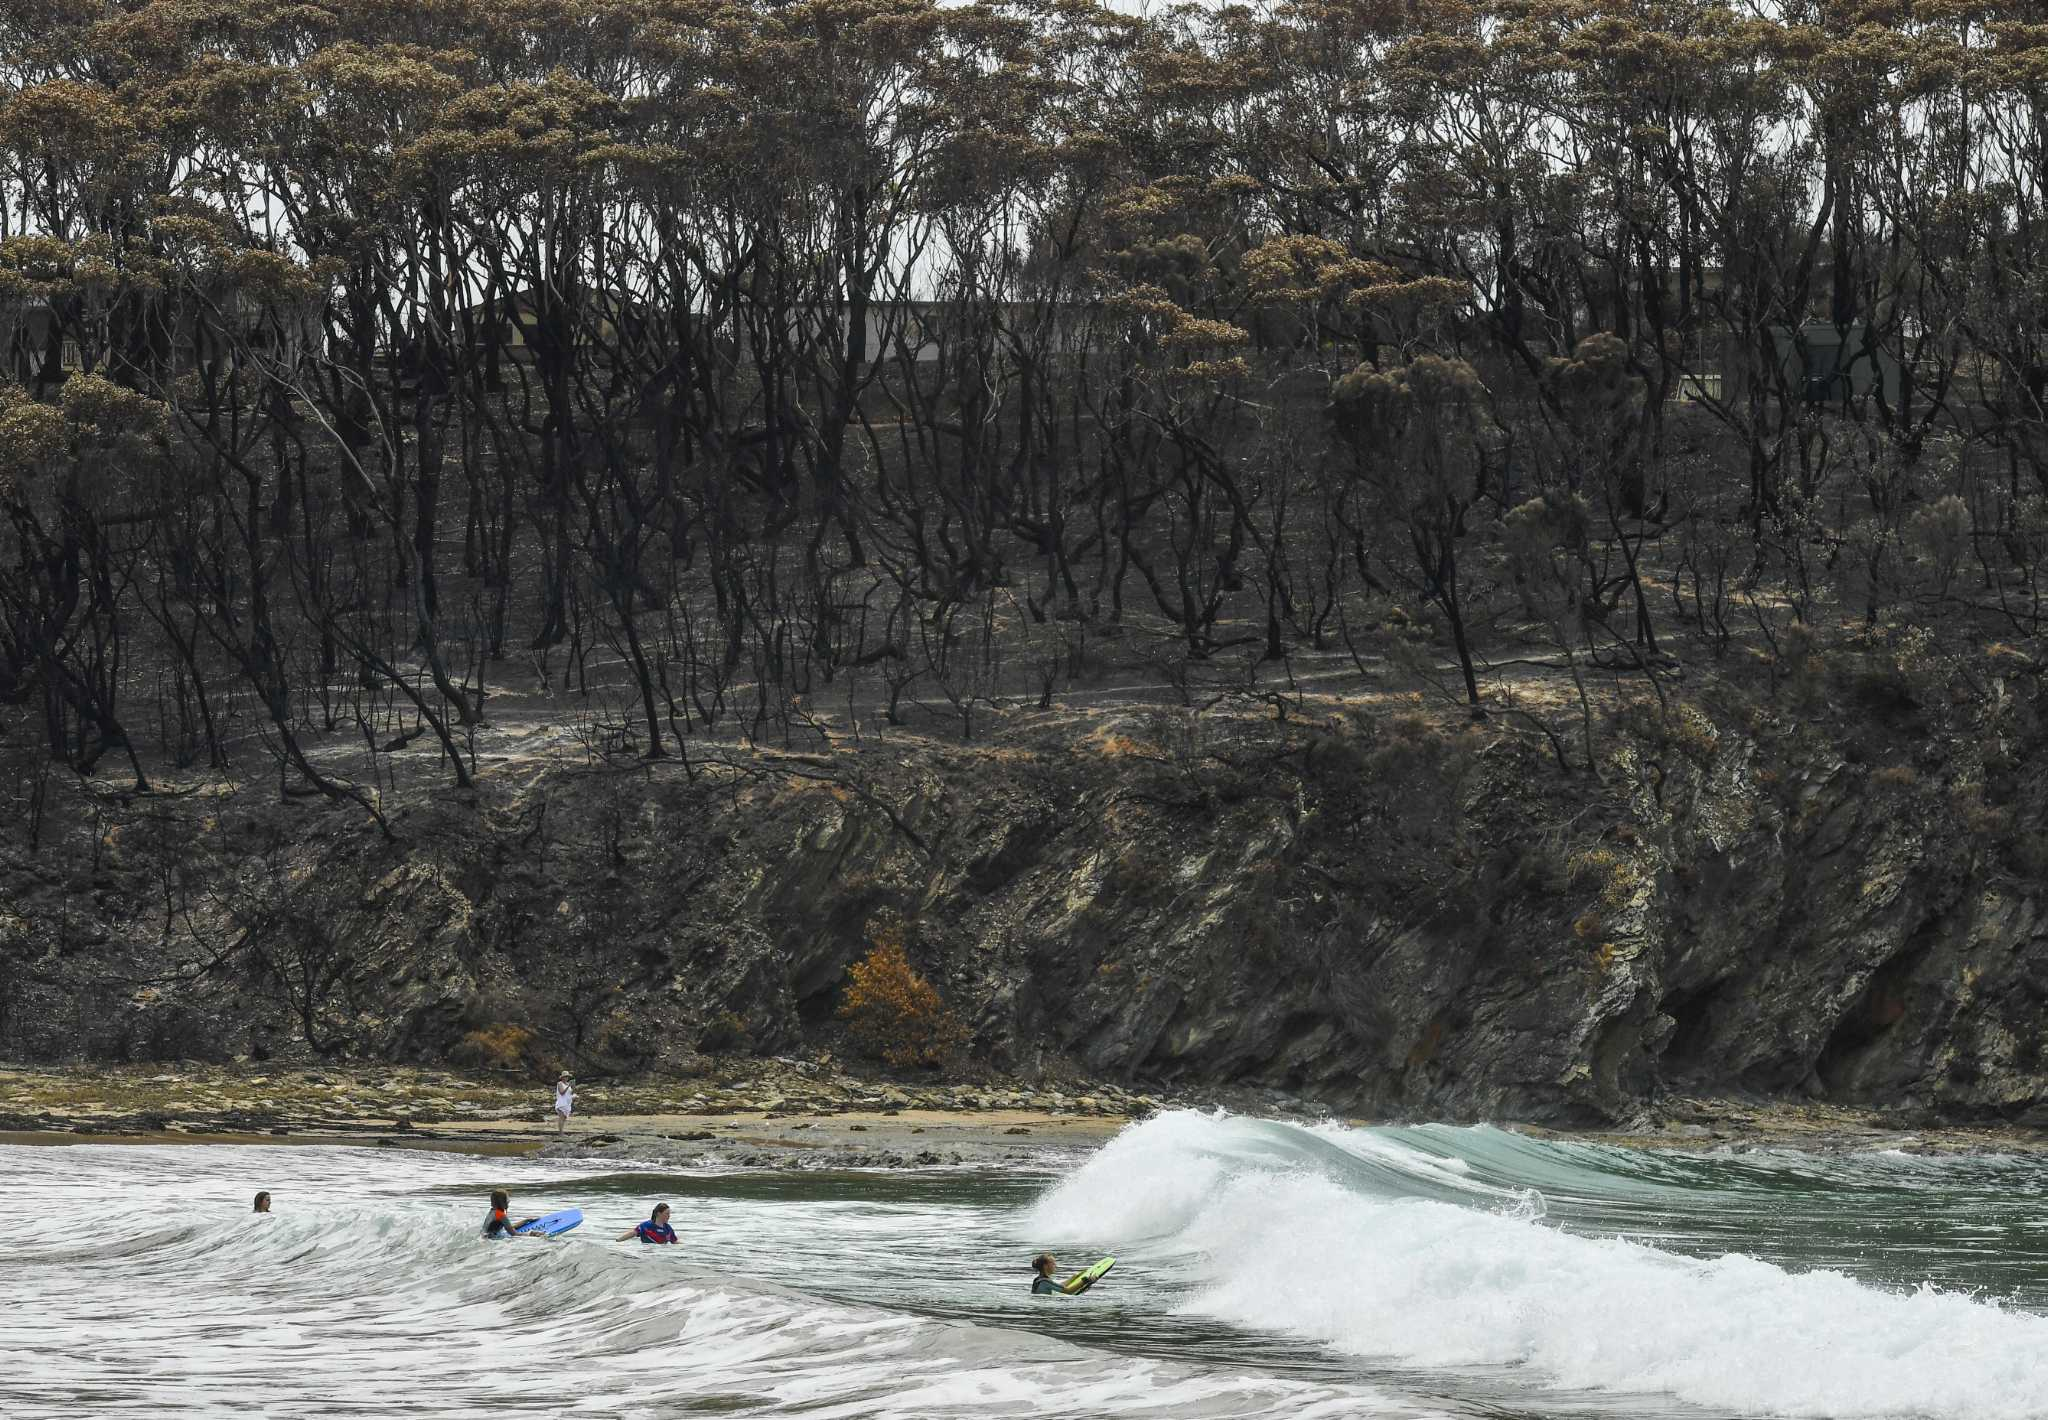 In Australia, a climate uprising